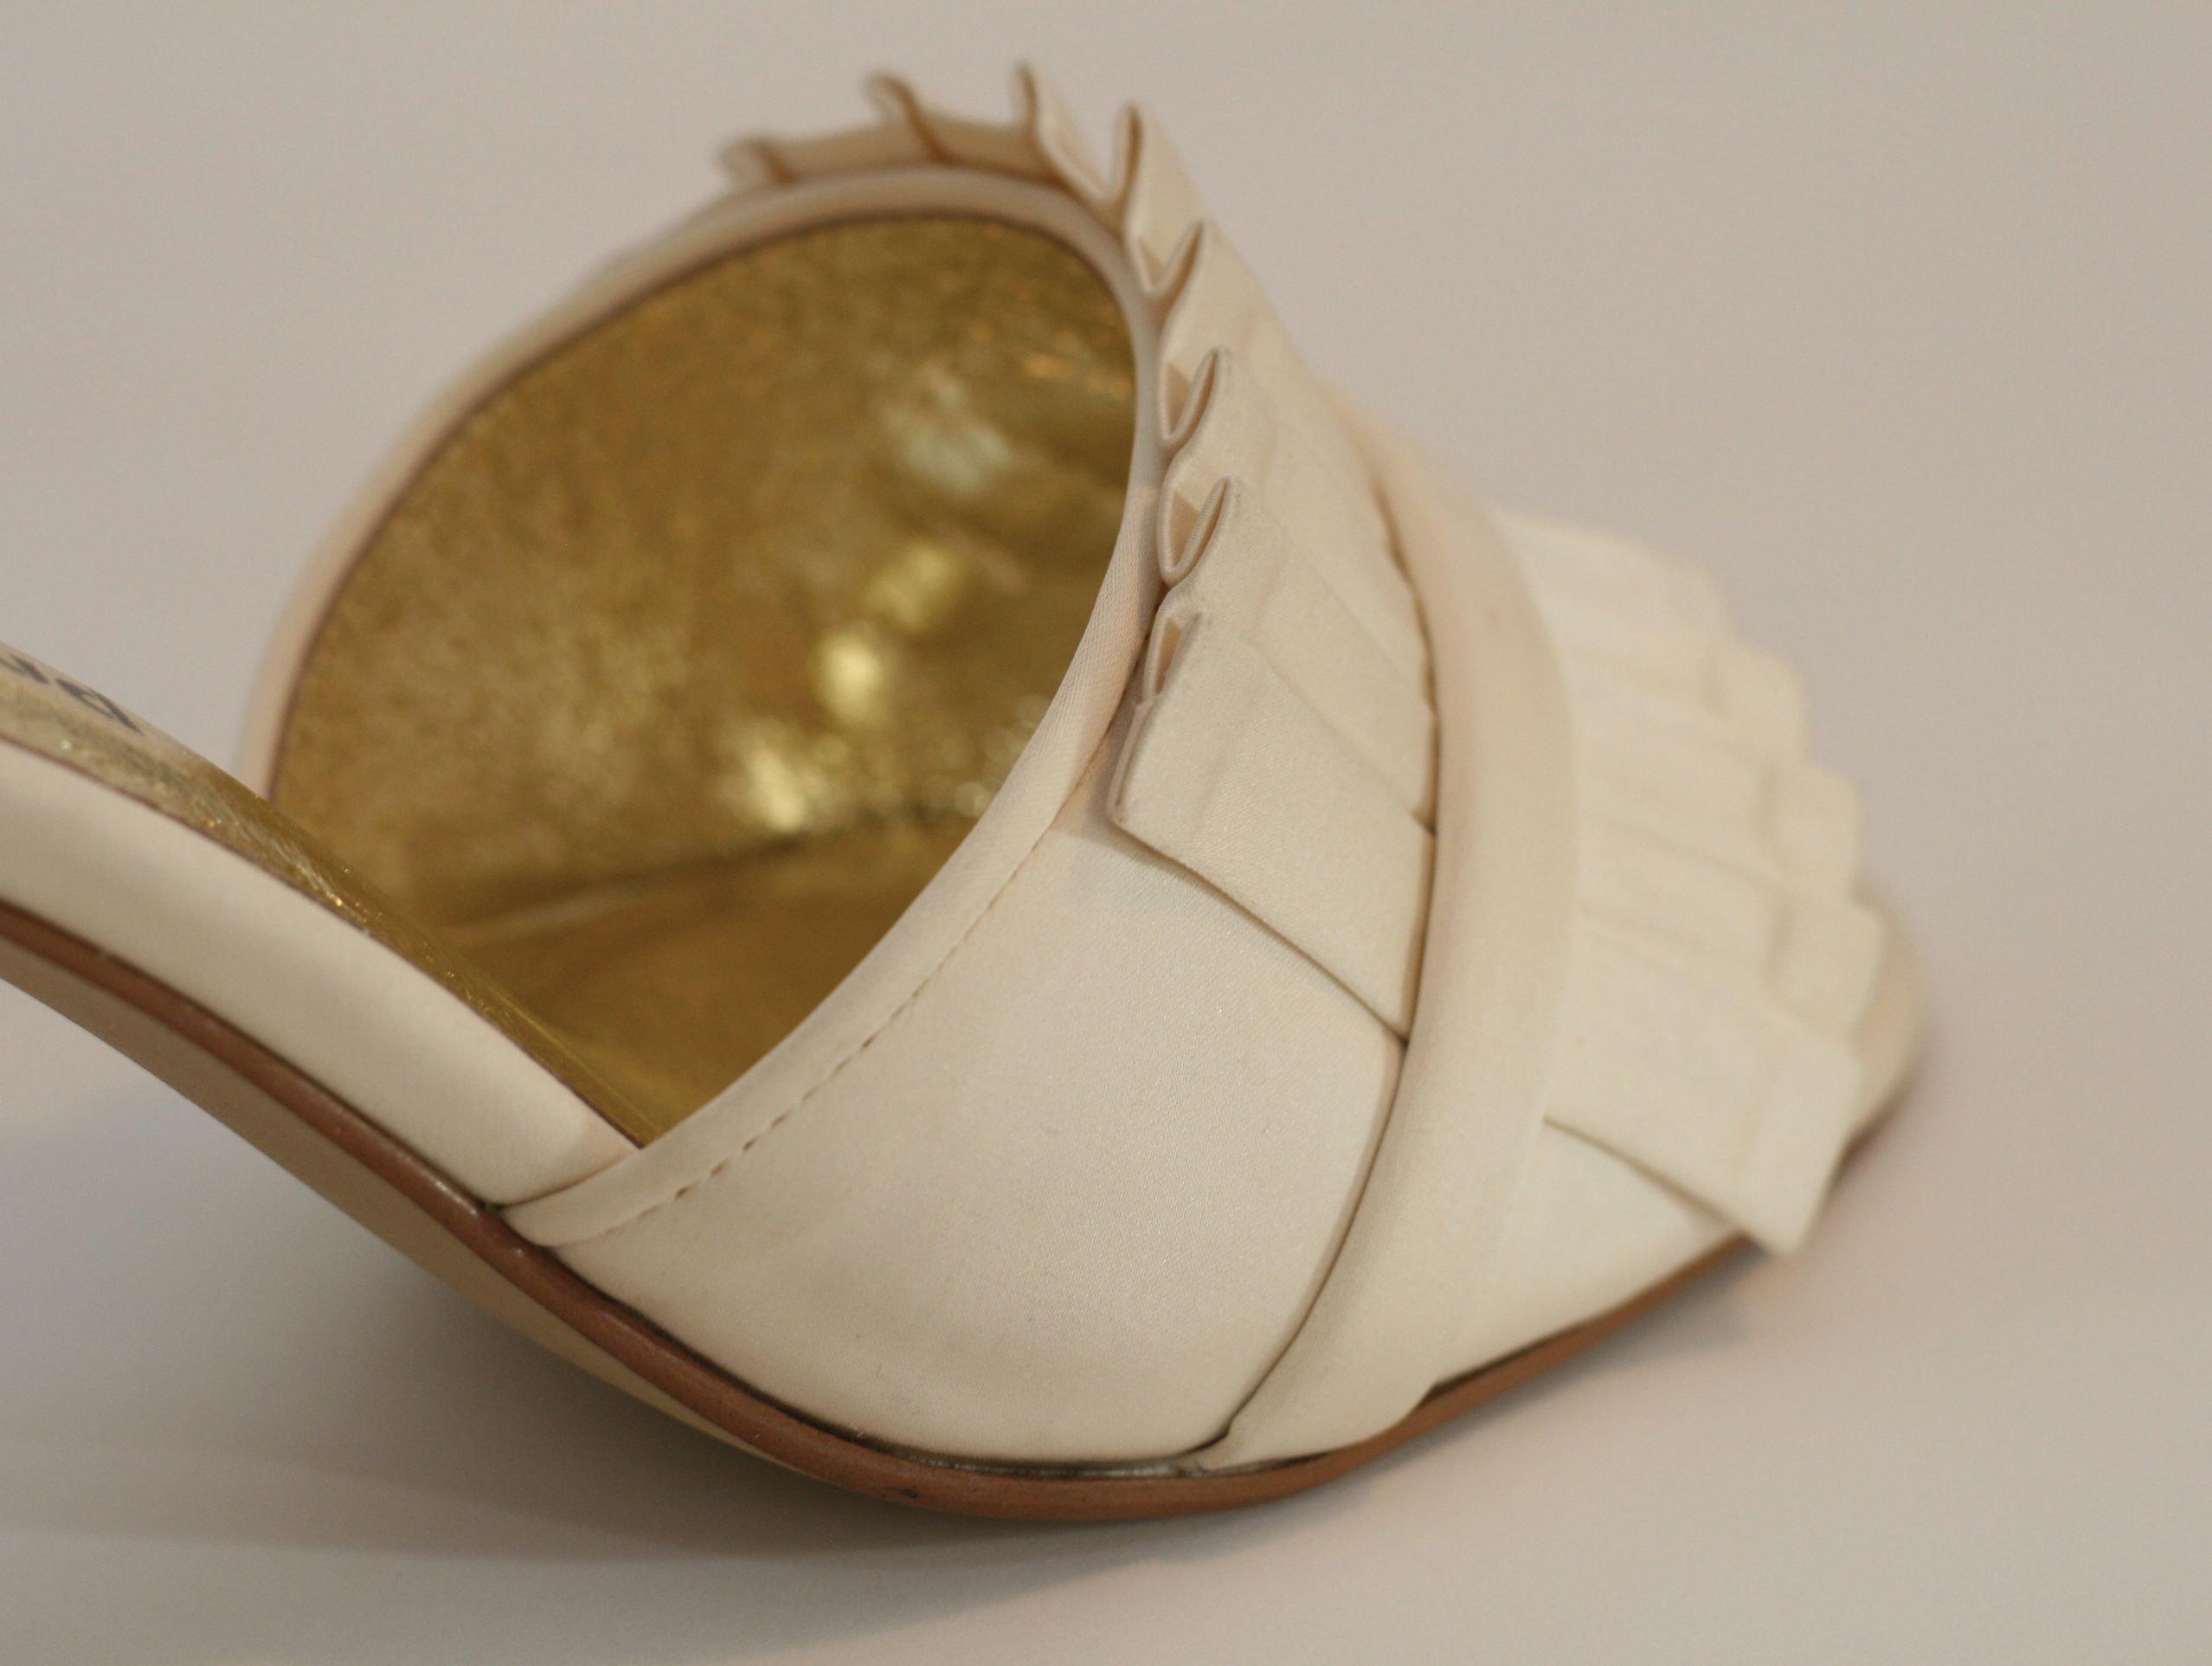 Chelsea Ivory Satin - Toe